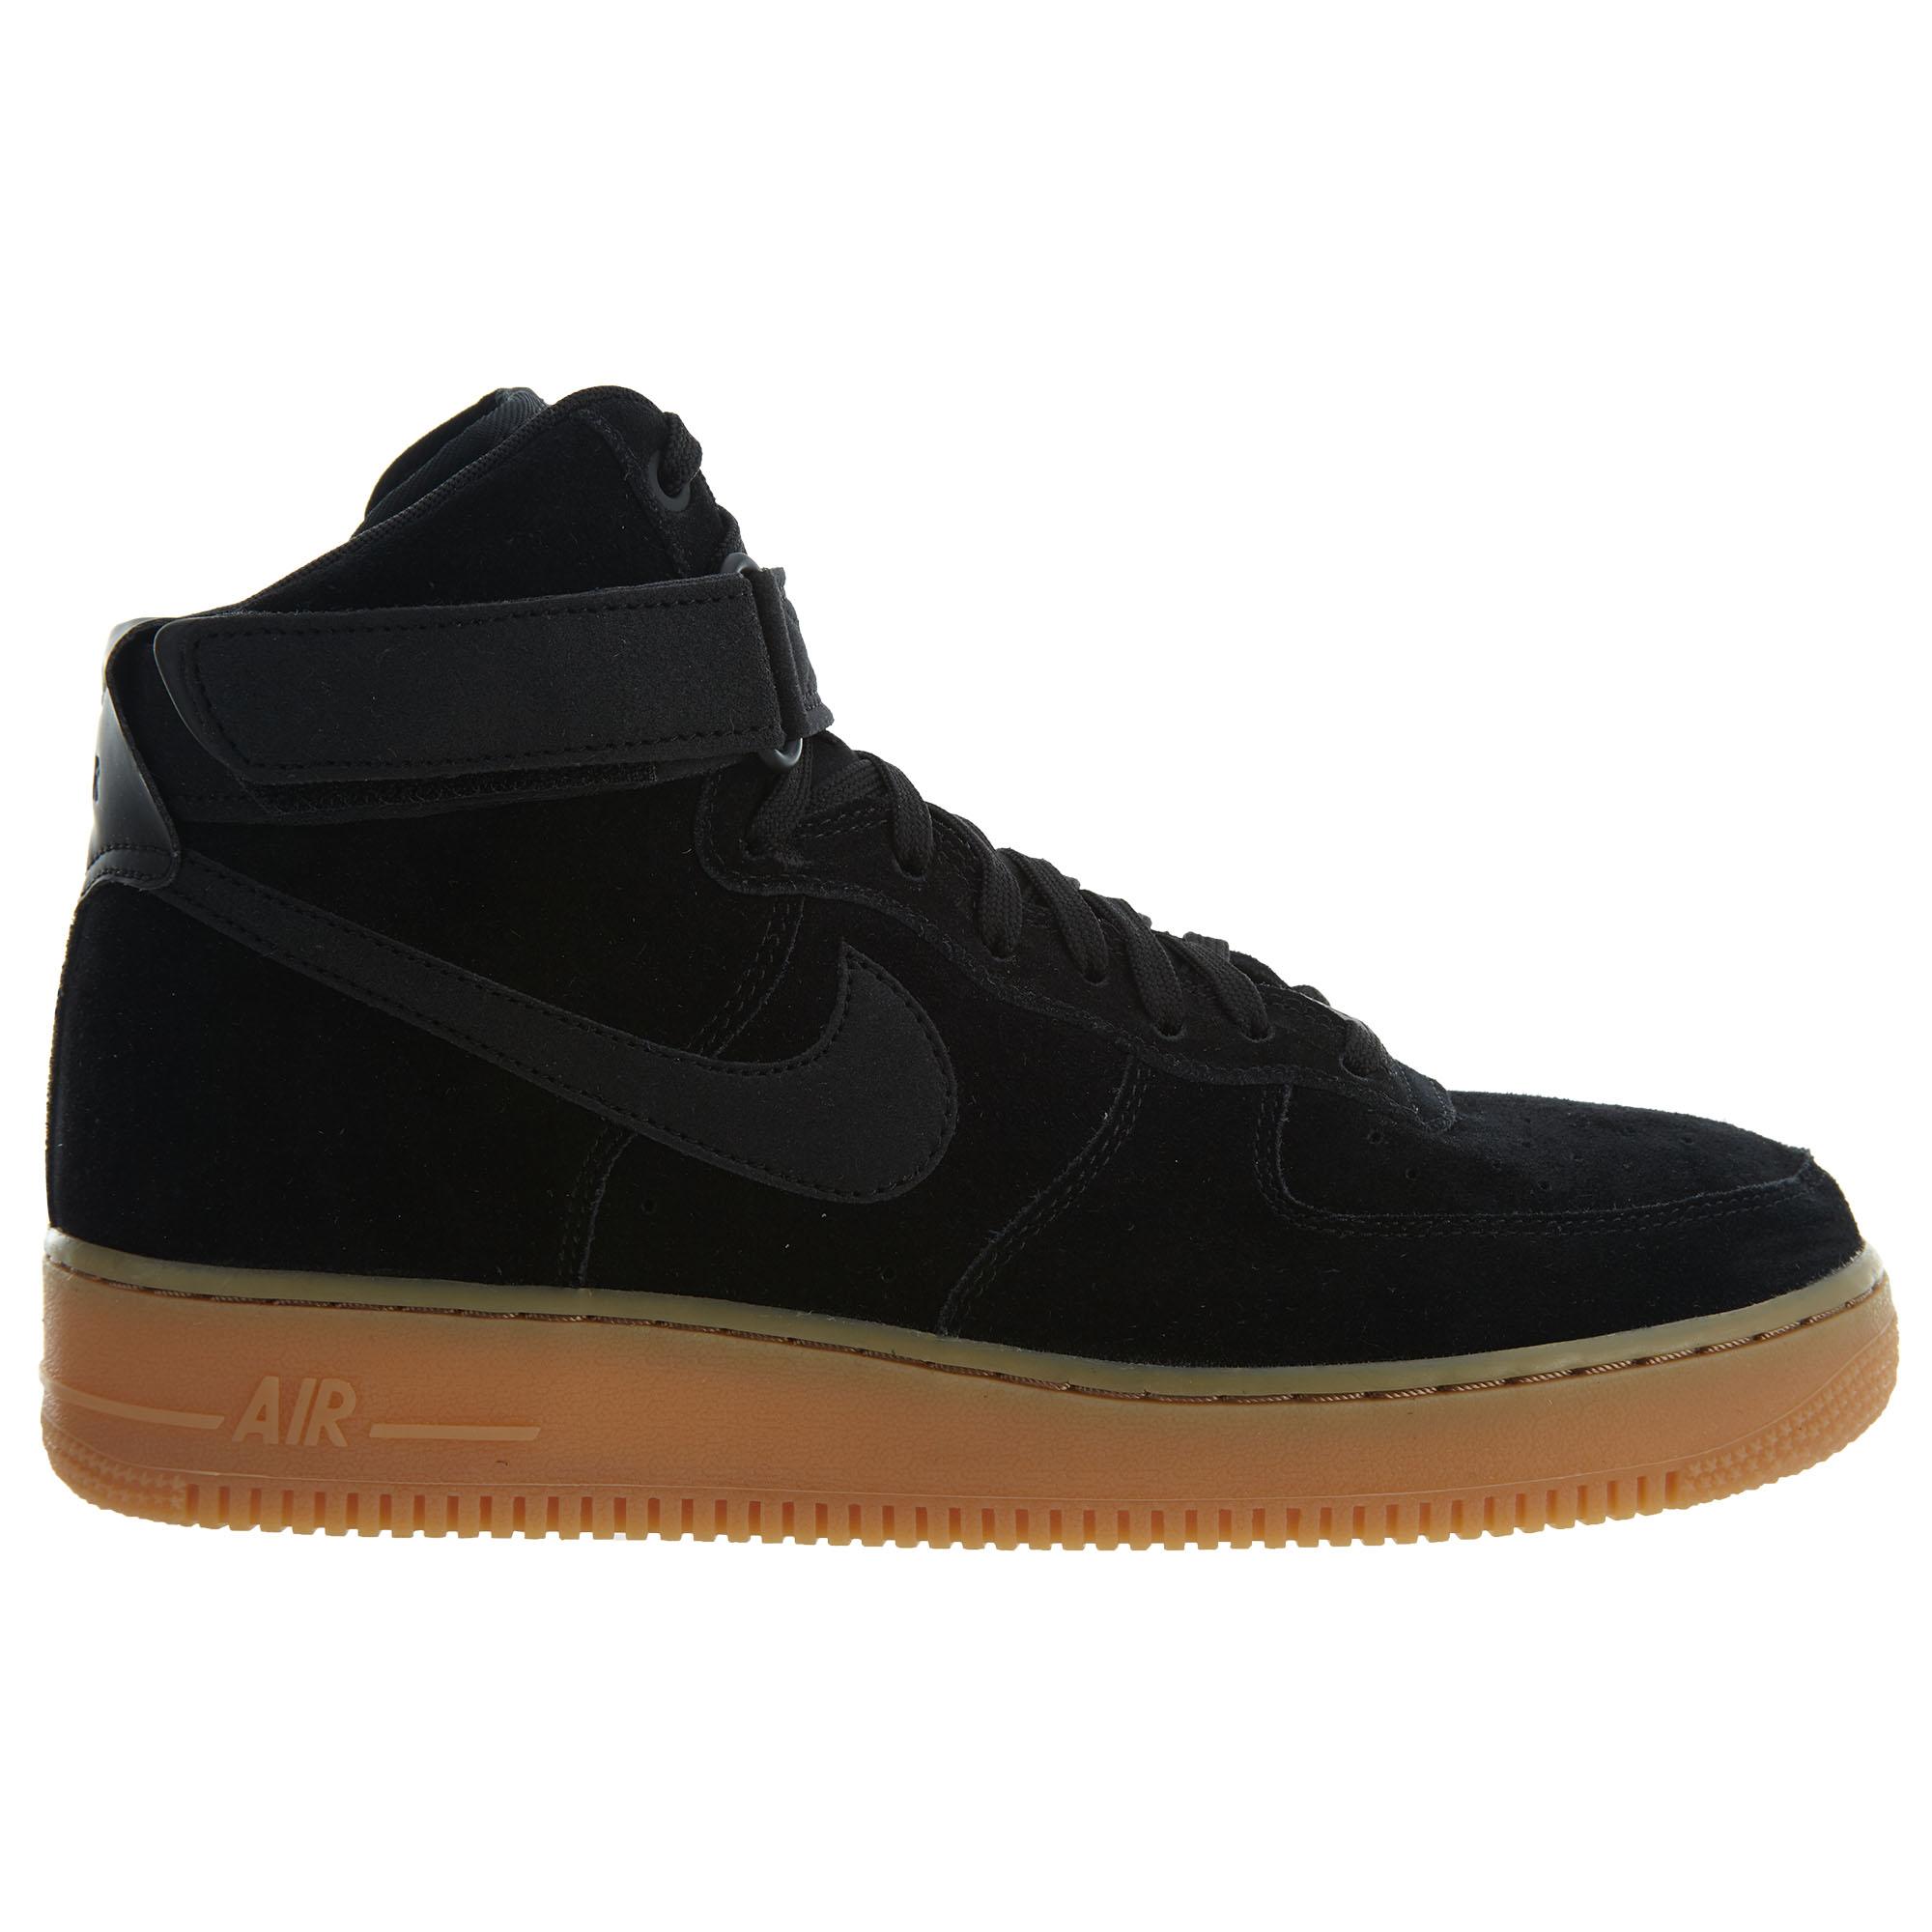 Nike Air Force 1 High 07 Lv8 Suede Black/Black-Gum Med Brown